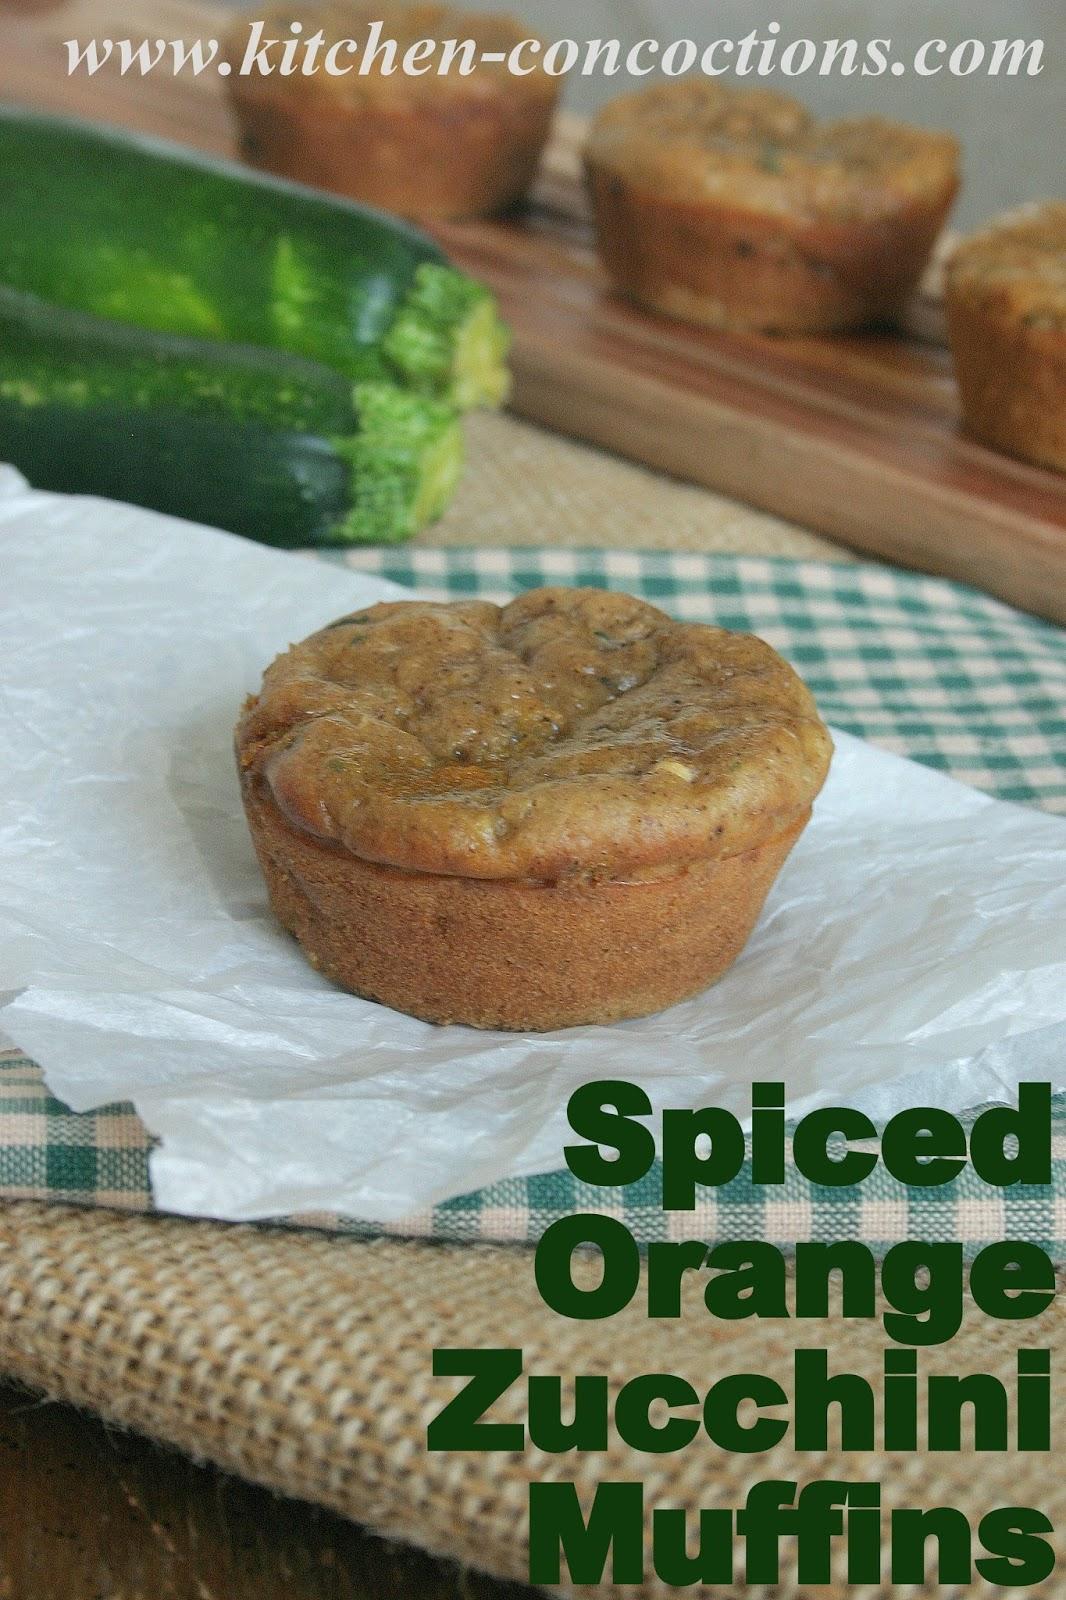 Spiced Orange Zucchini Muffins - Kitchen Concoctions